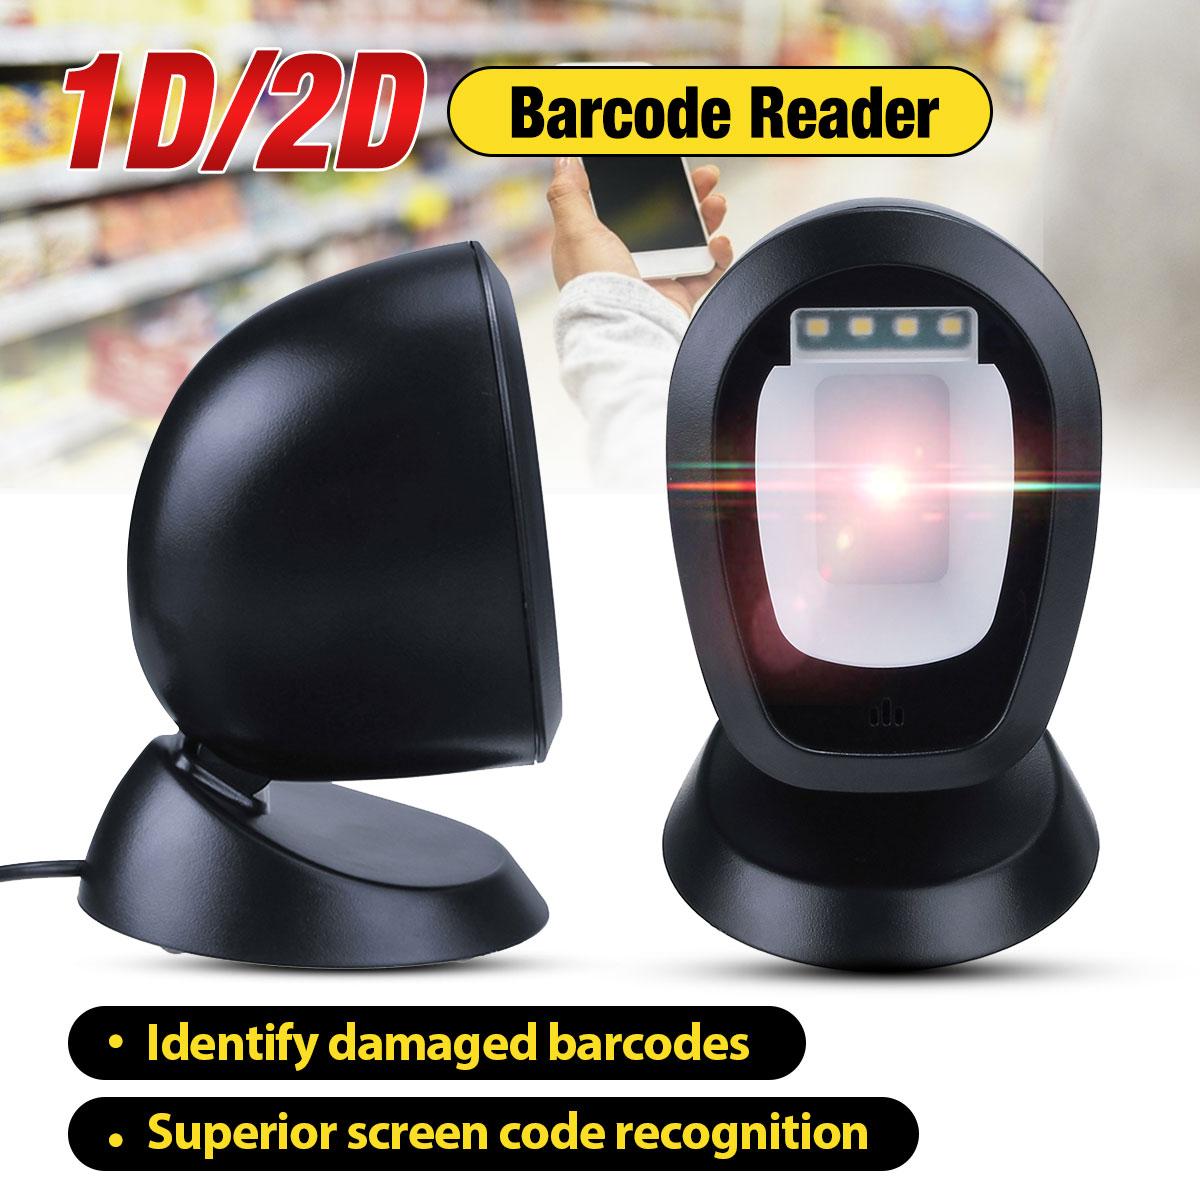 usb scanner de codigo de barras automatico handsfree 1d 2d scanner 360 graus rorating plataforma de